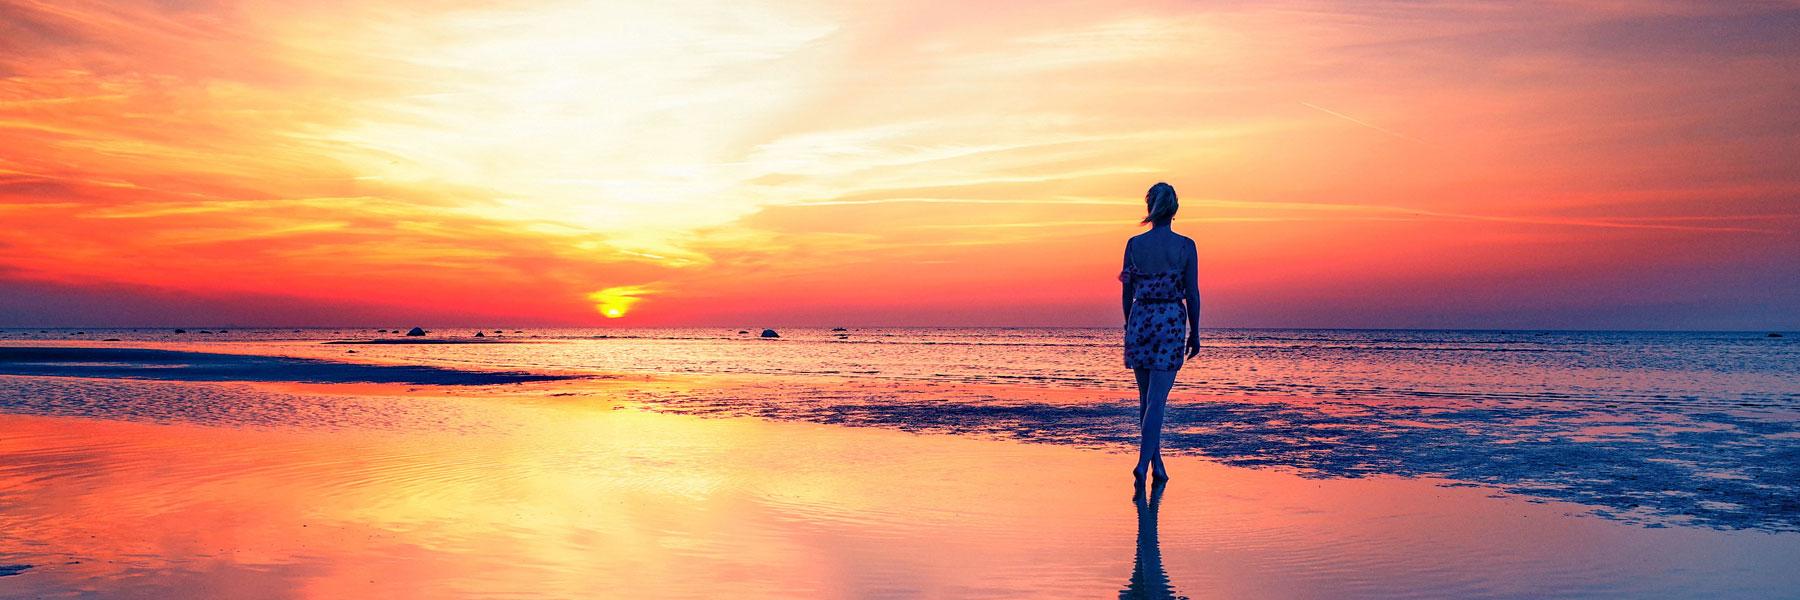 Sonnenuntergang - Insel Poel